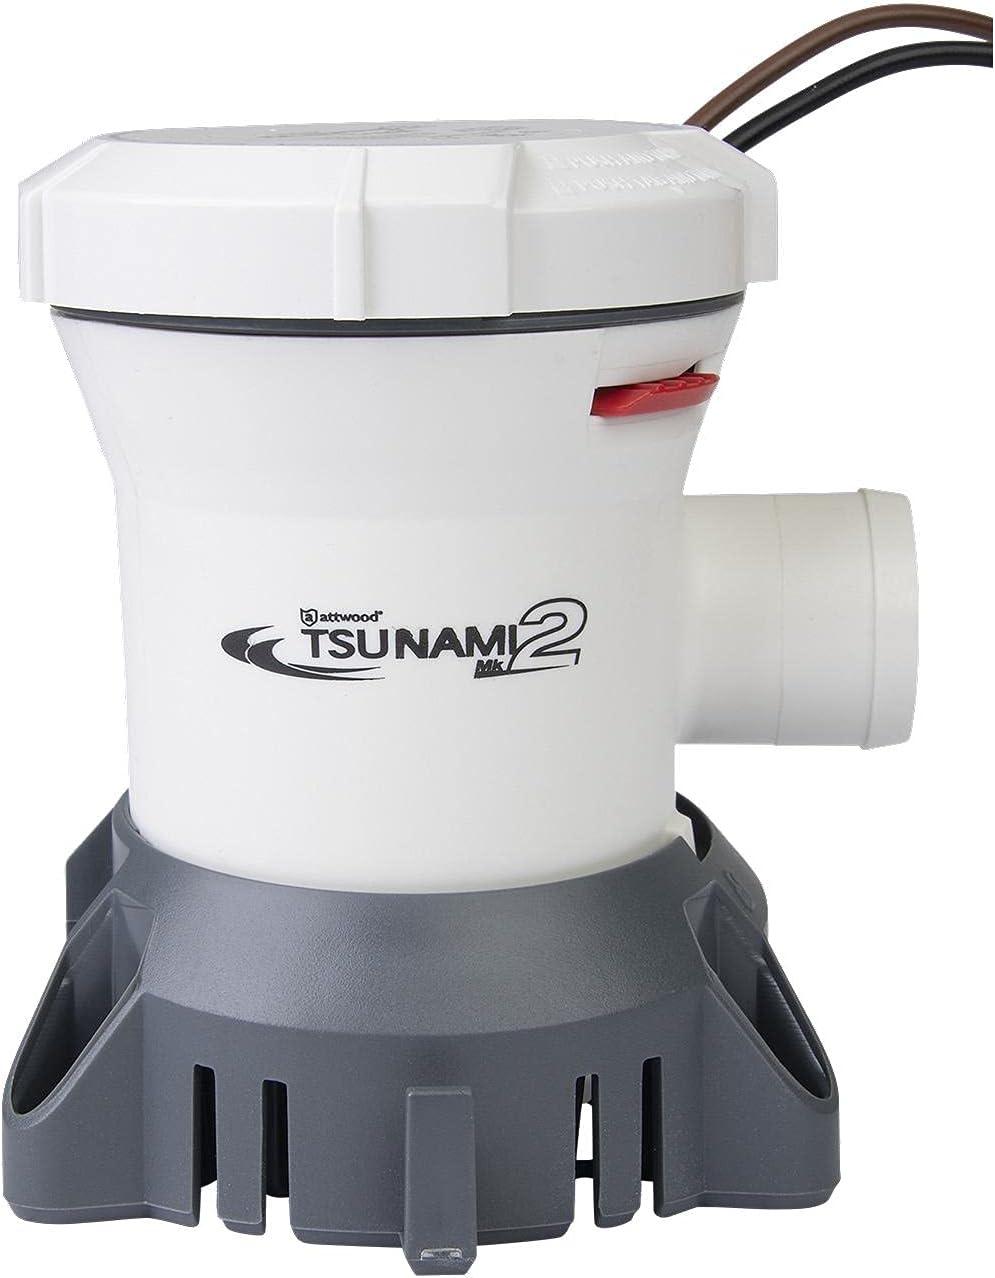 Attwood Tsunami MK2 1200 2021 new GPH 24-Volt Thred Bilge Manual In stock